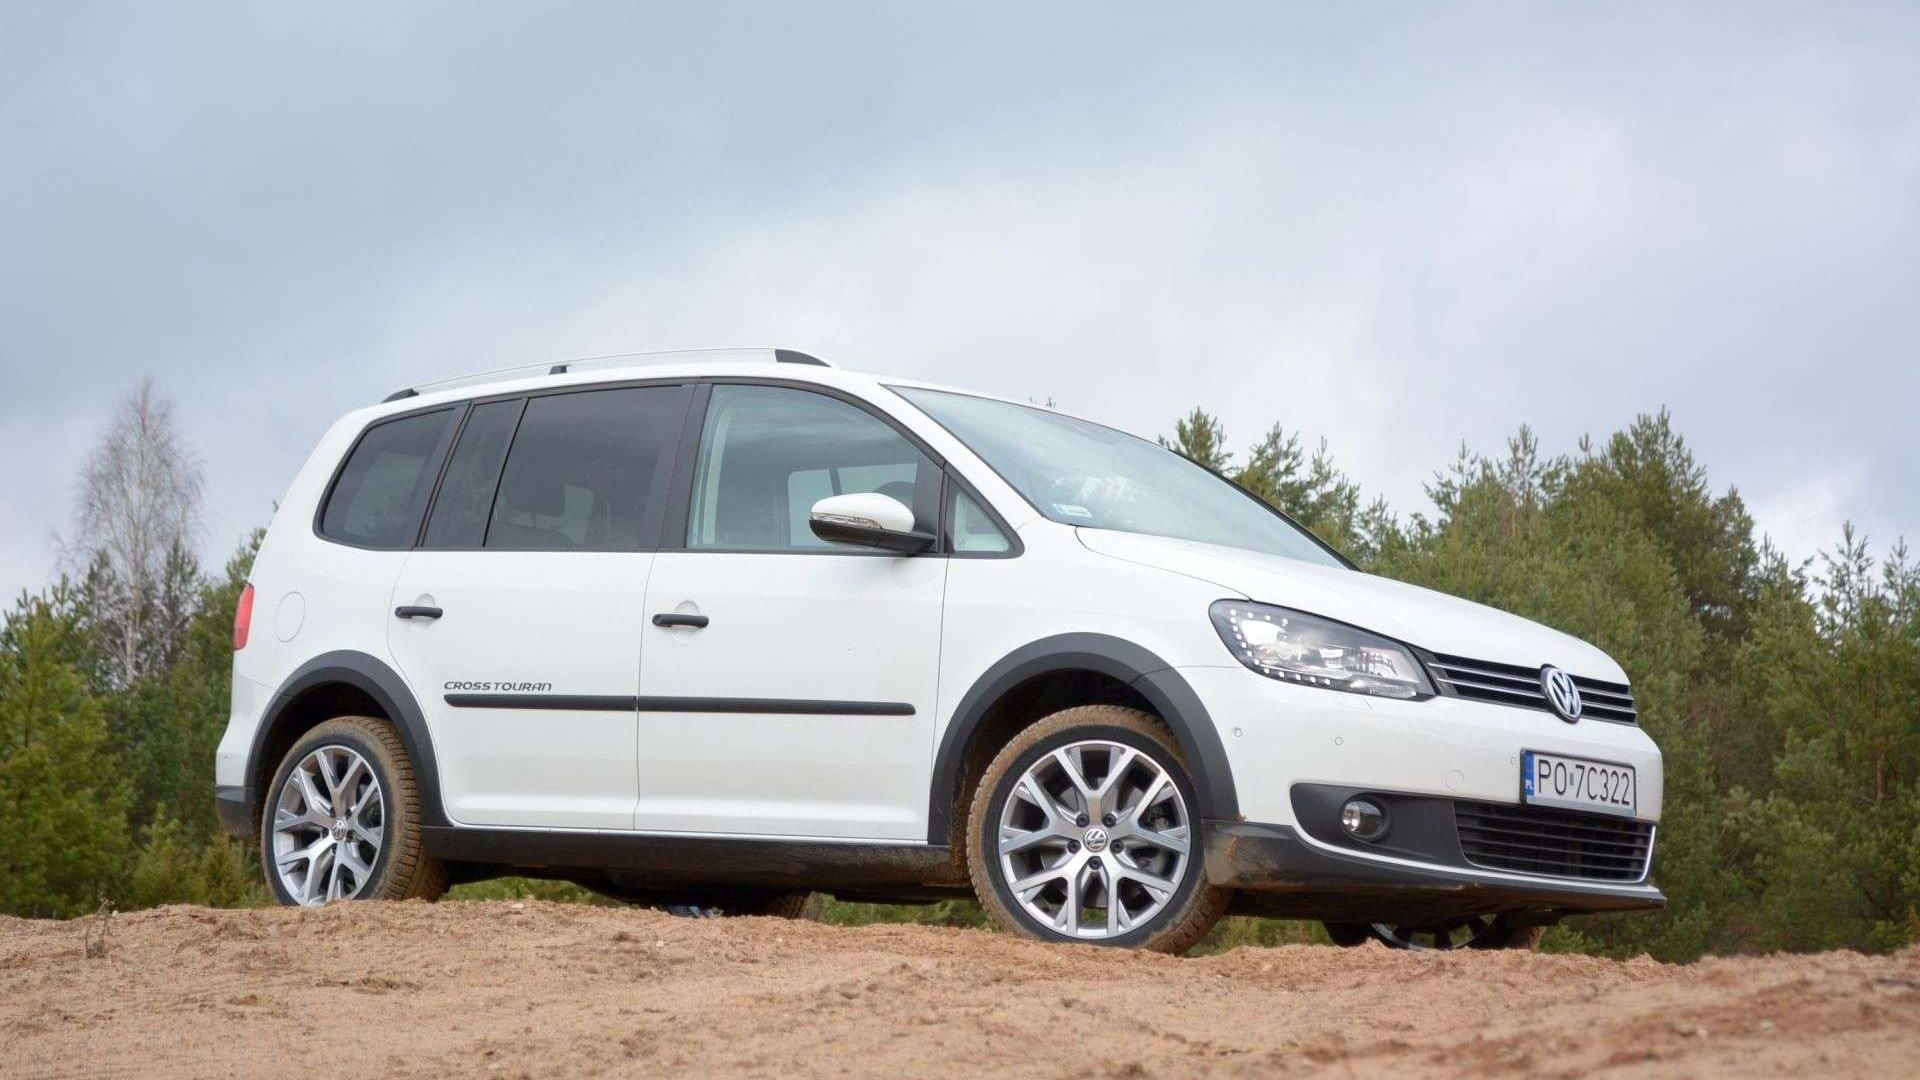 Volkswagen Cross Touran z rodziną za miasto Voiture